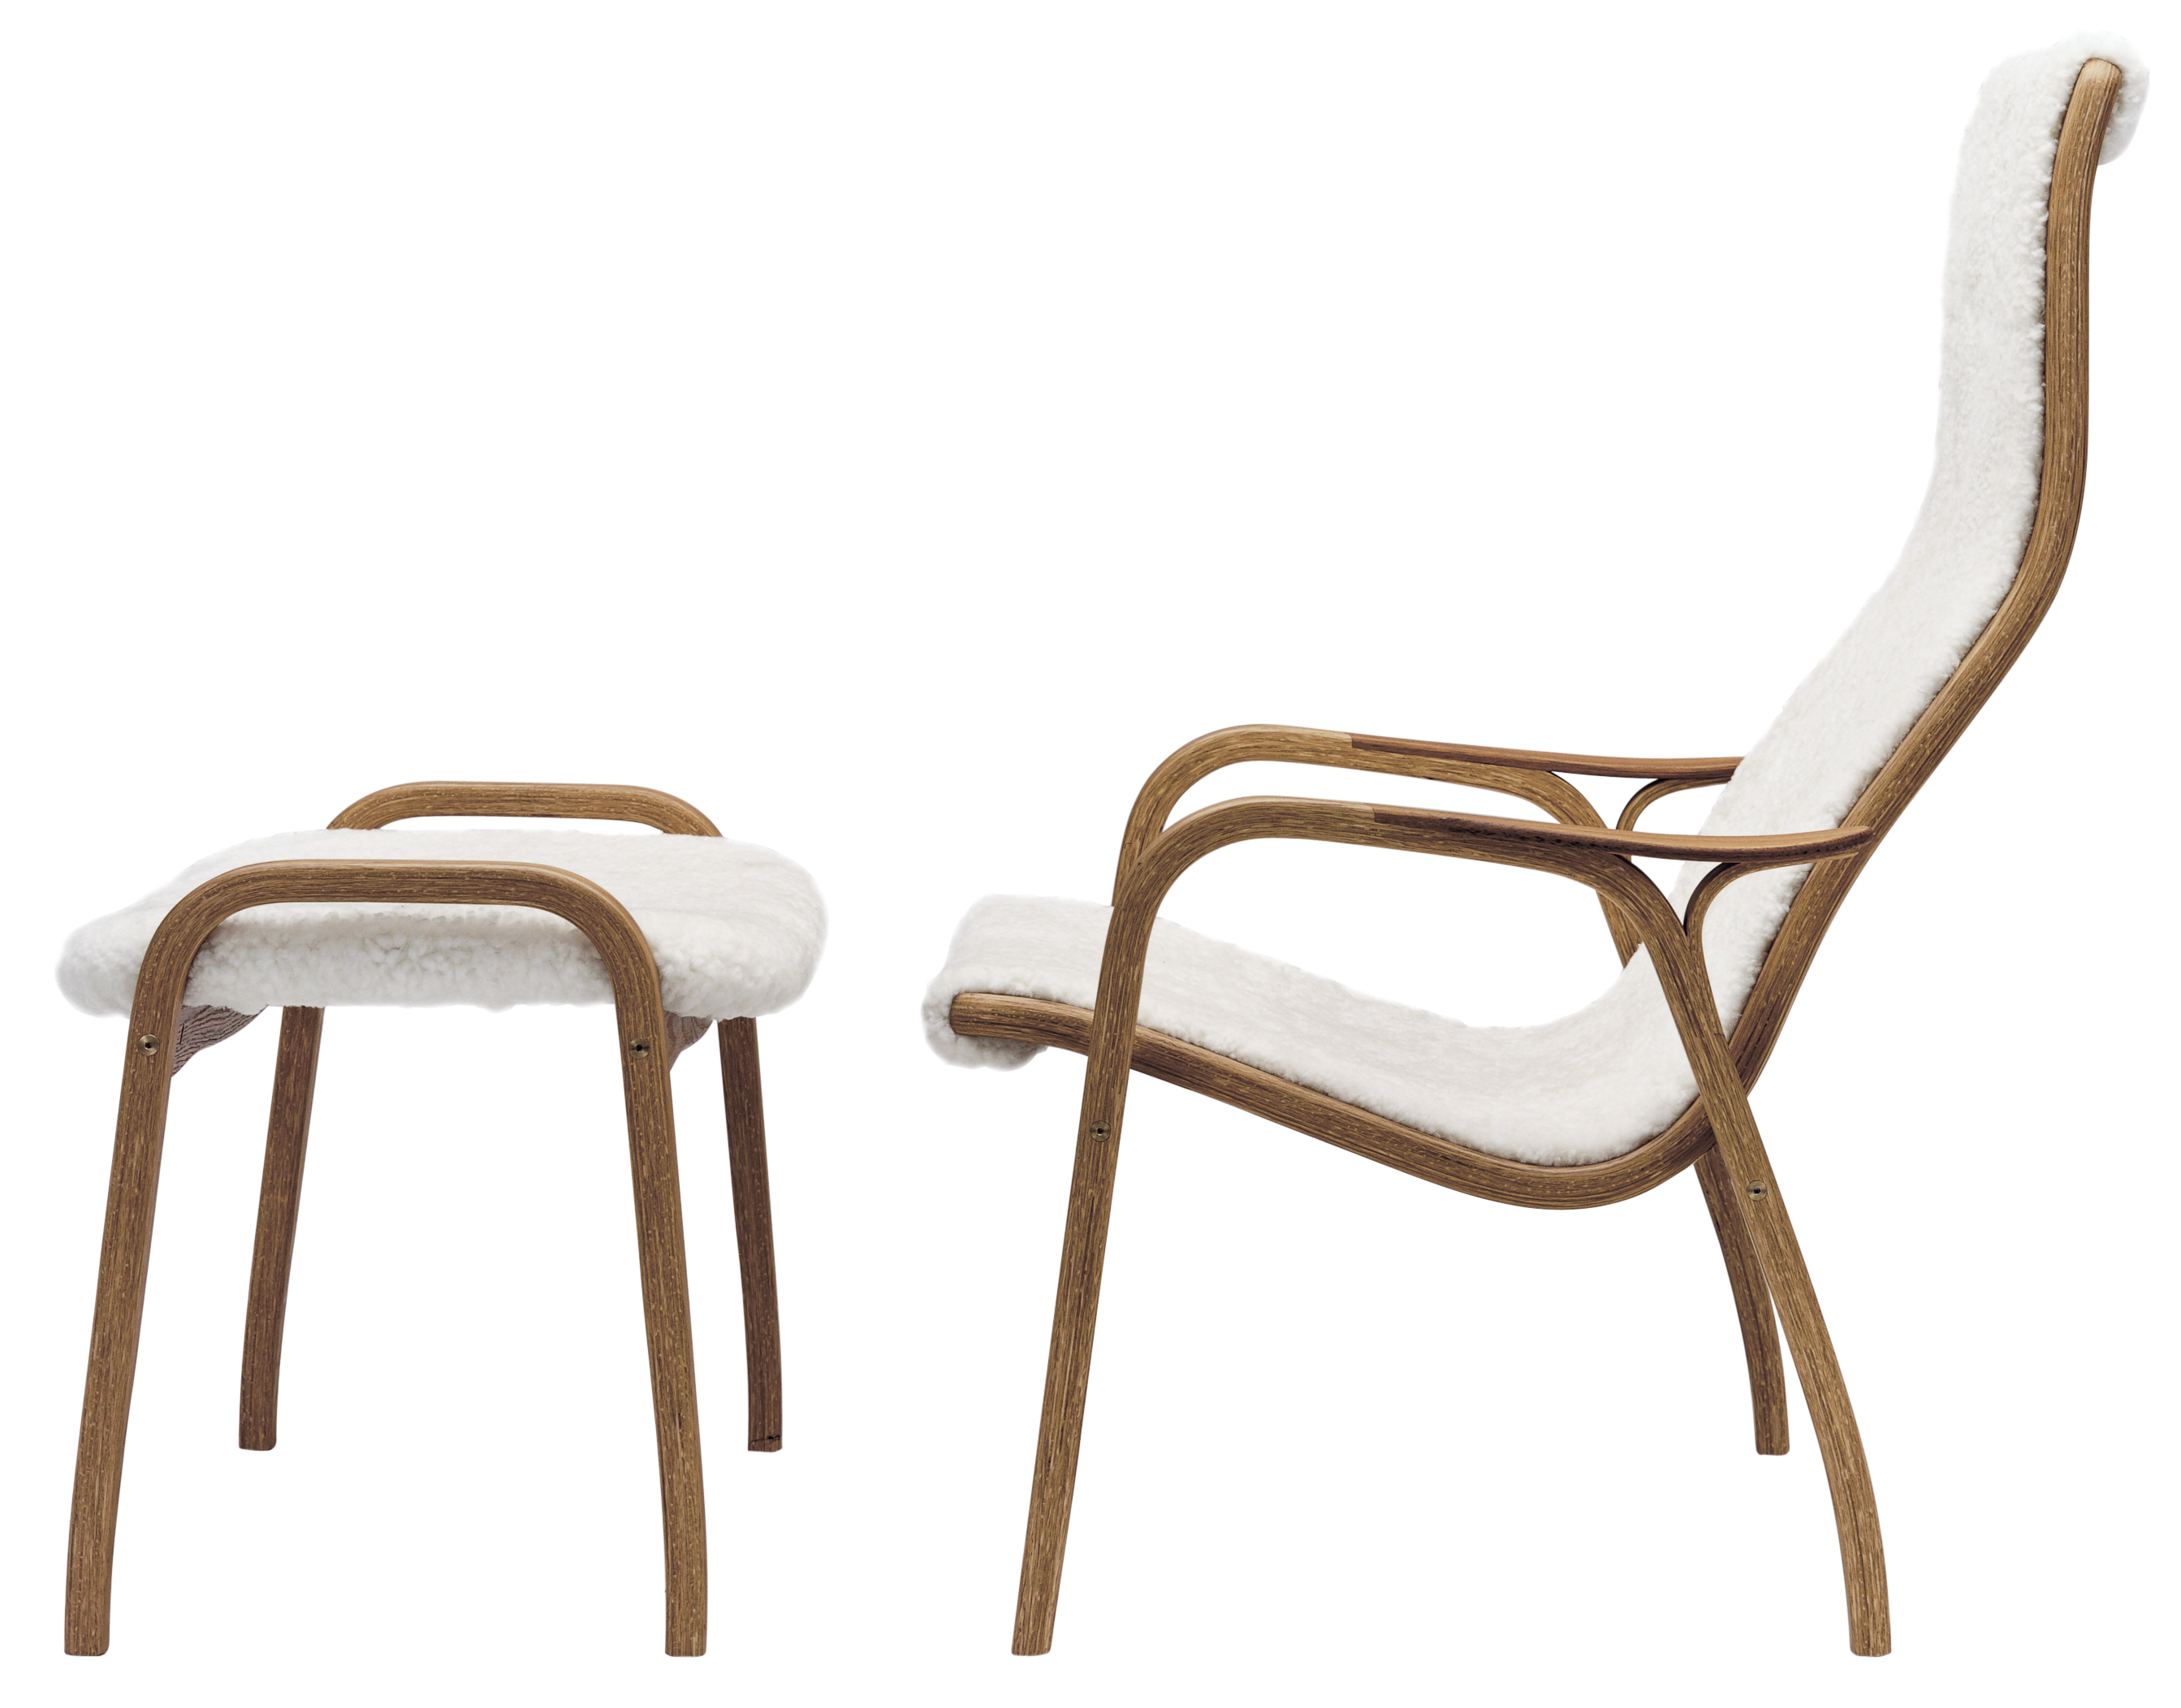 Fauteuil LAMINO de Yngve Ekström, Swedese möbler